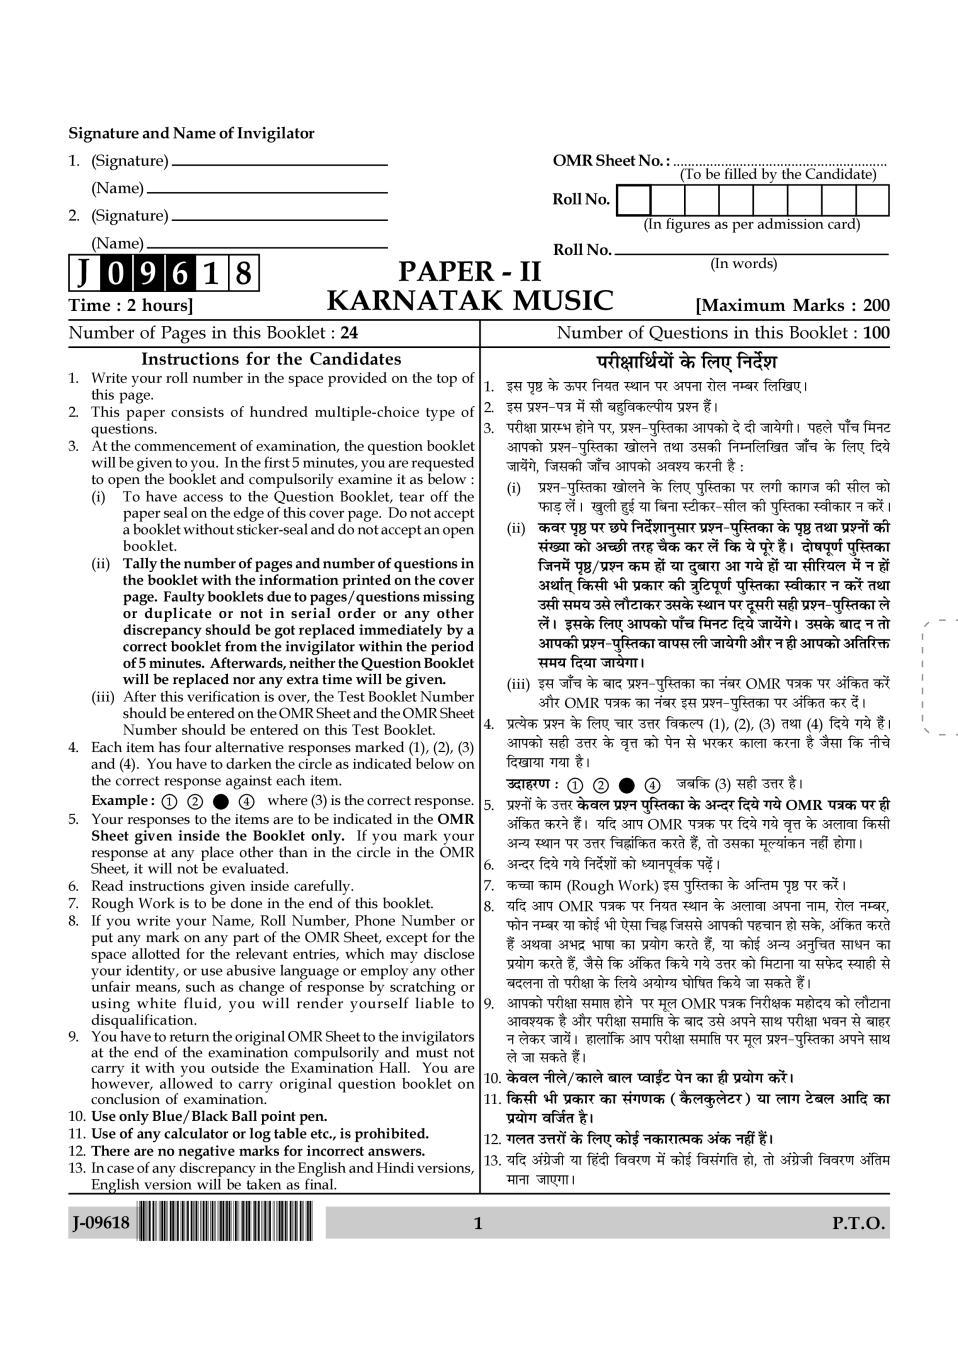 UGC NET Karnatik Music Question Paper 2018 - Page 1